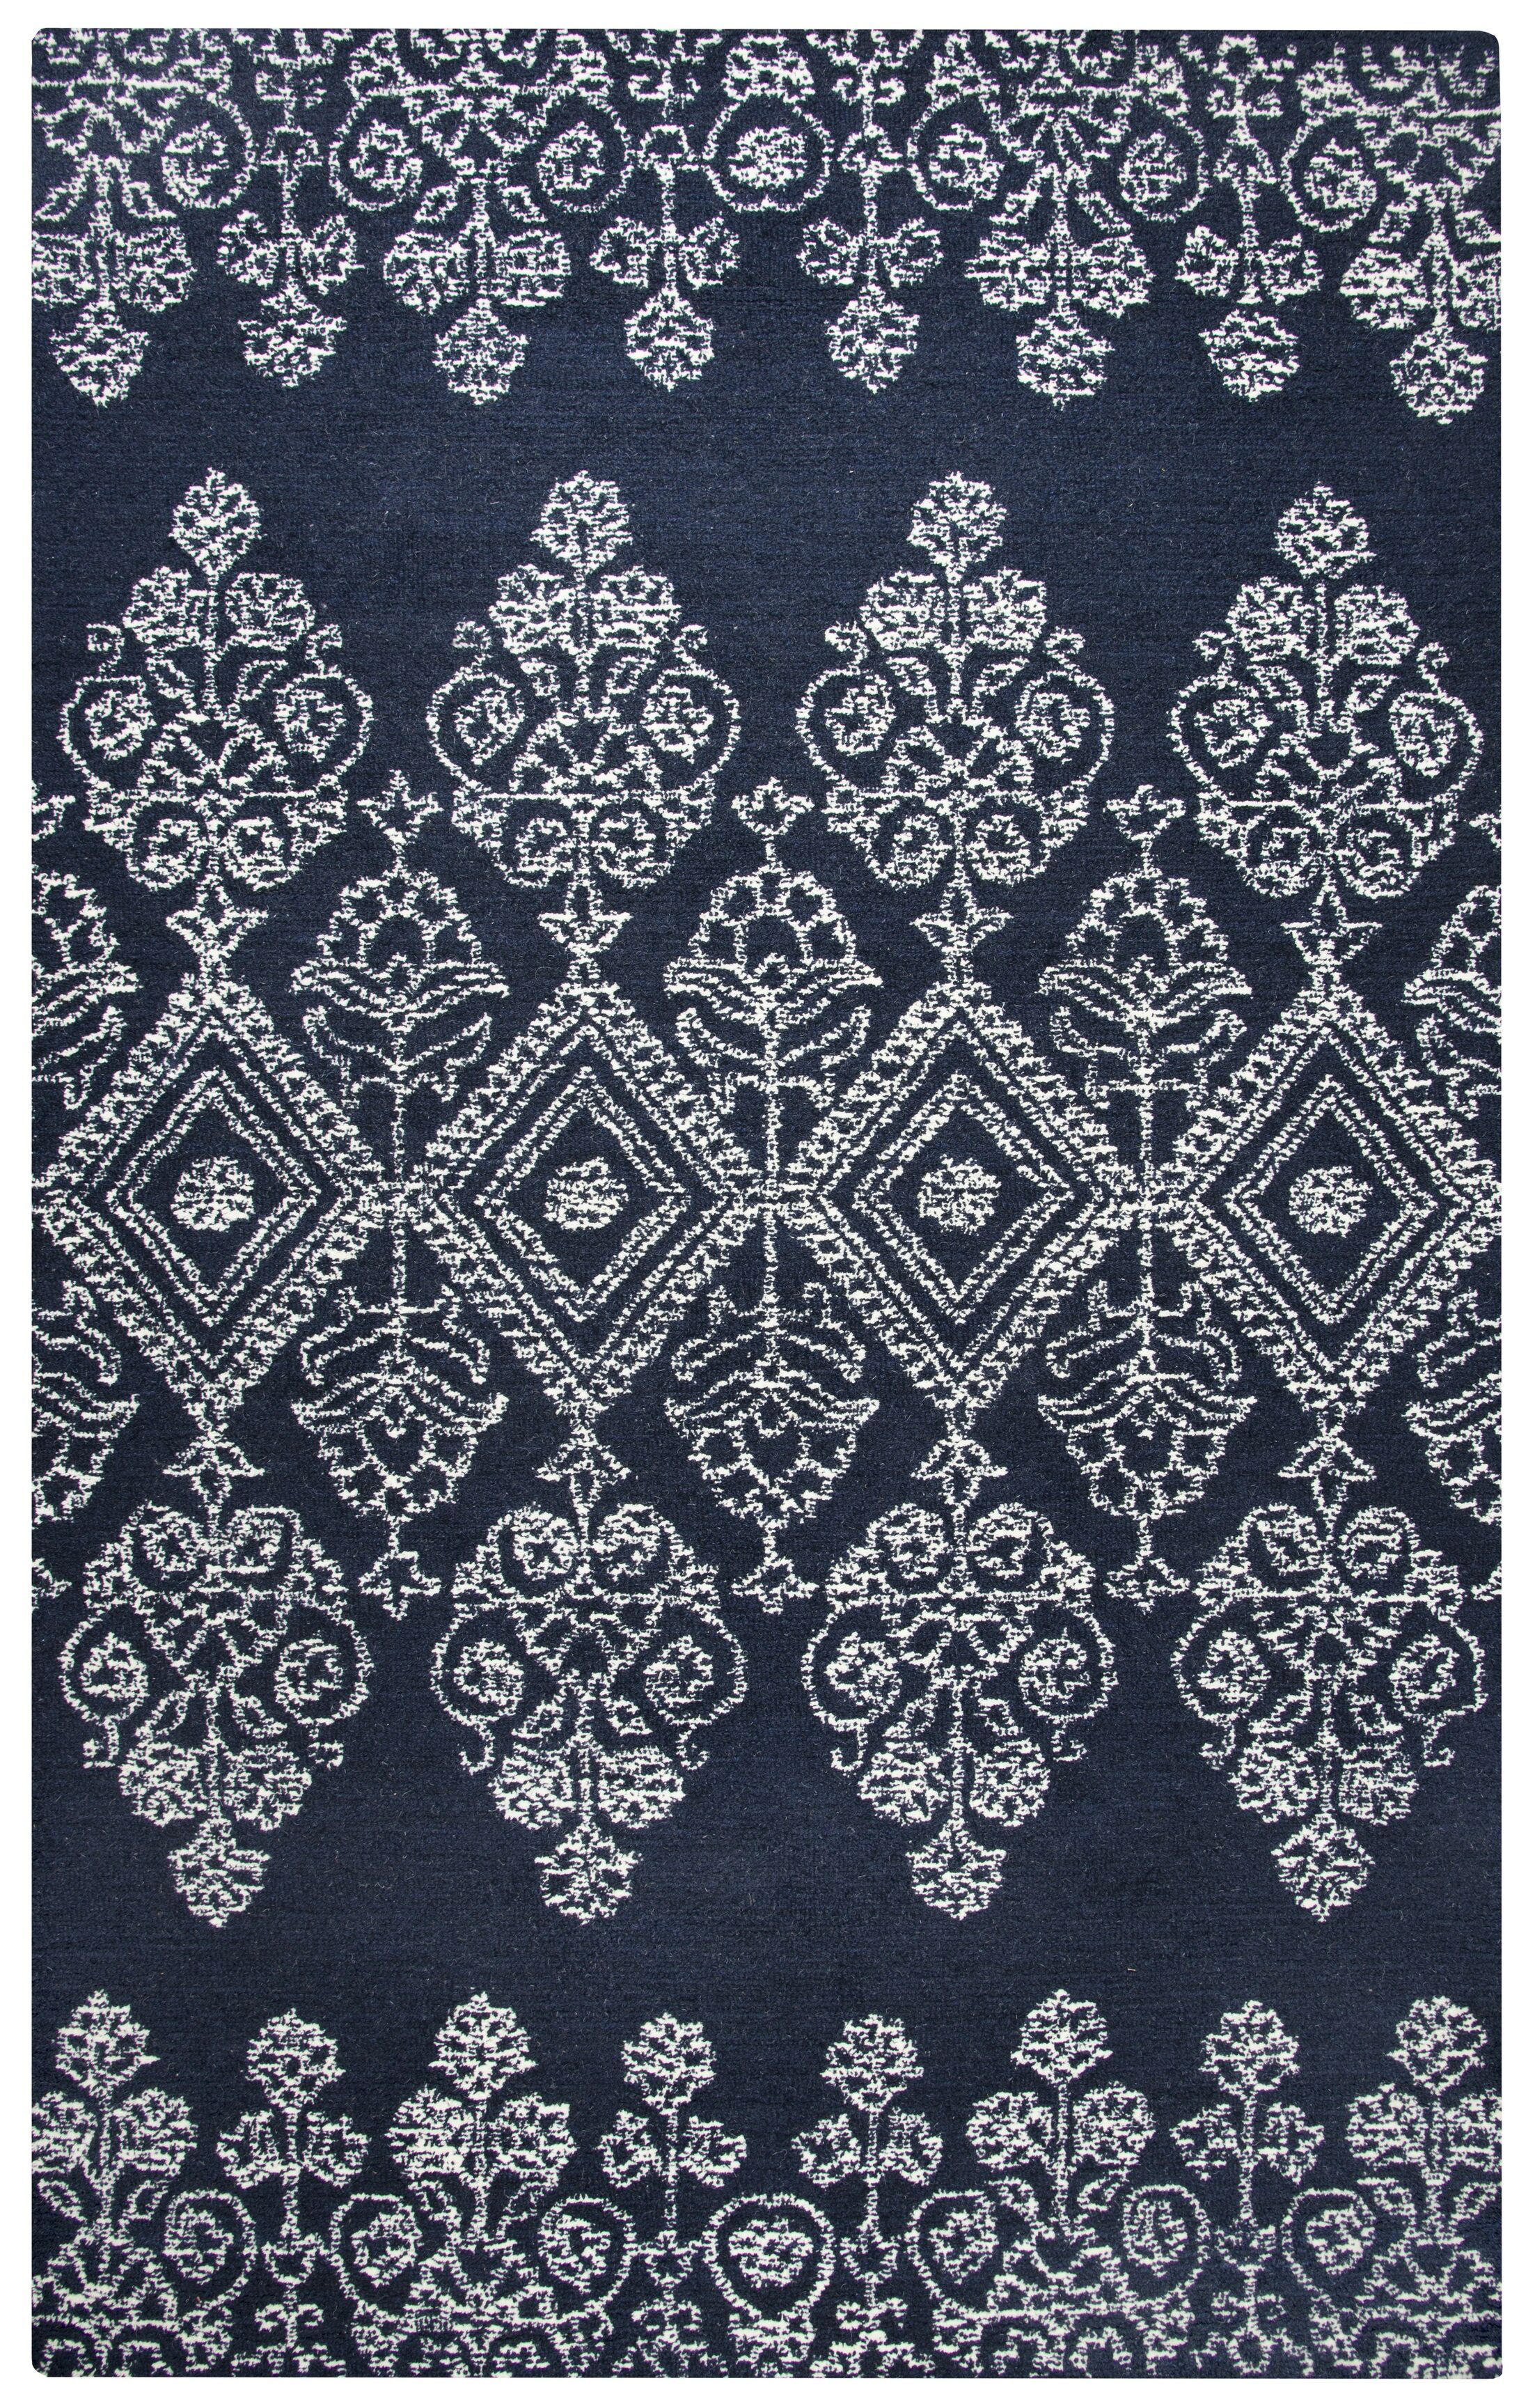 Avoca Hand-Tufted Ivory/Navy Area Rug Rug Size: Rectangle 9' x 12'